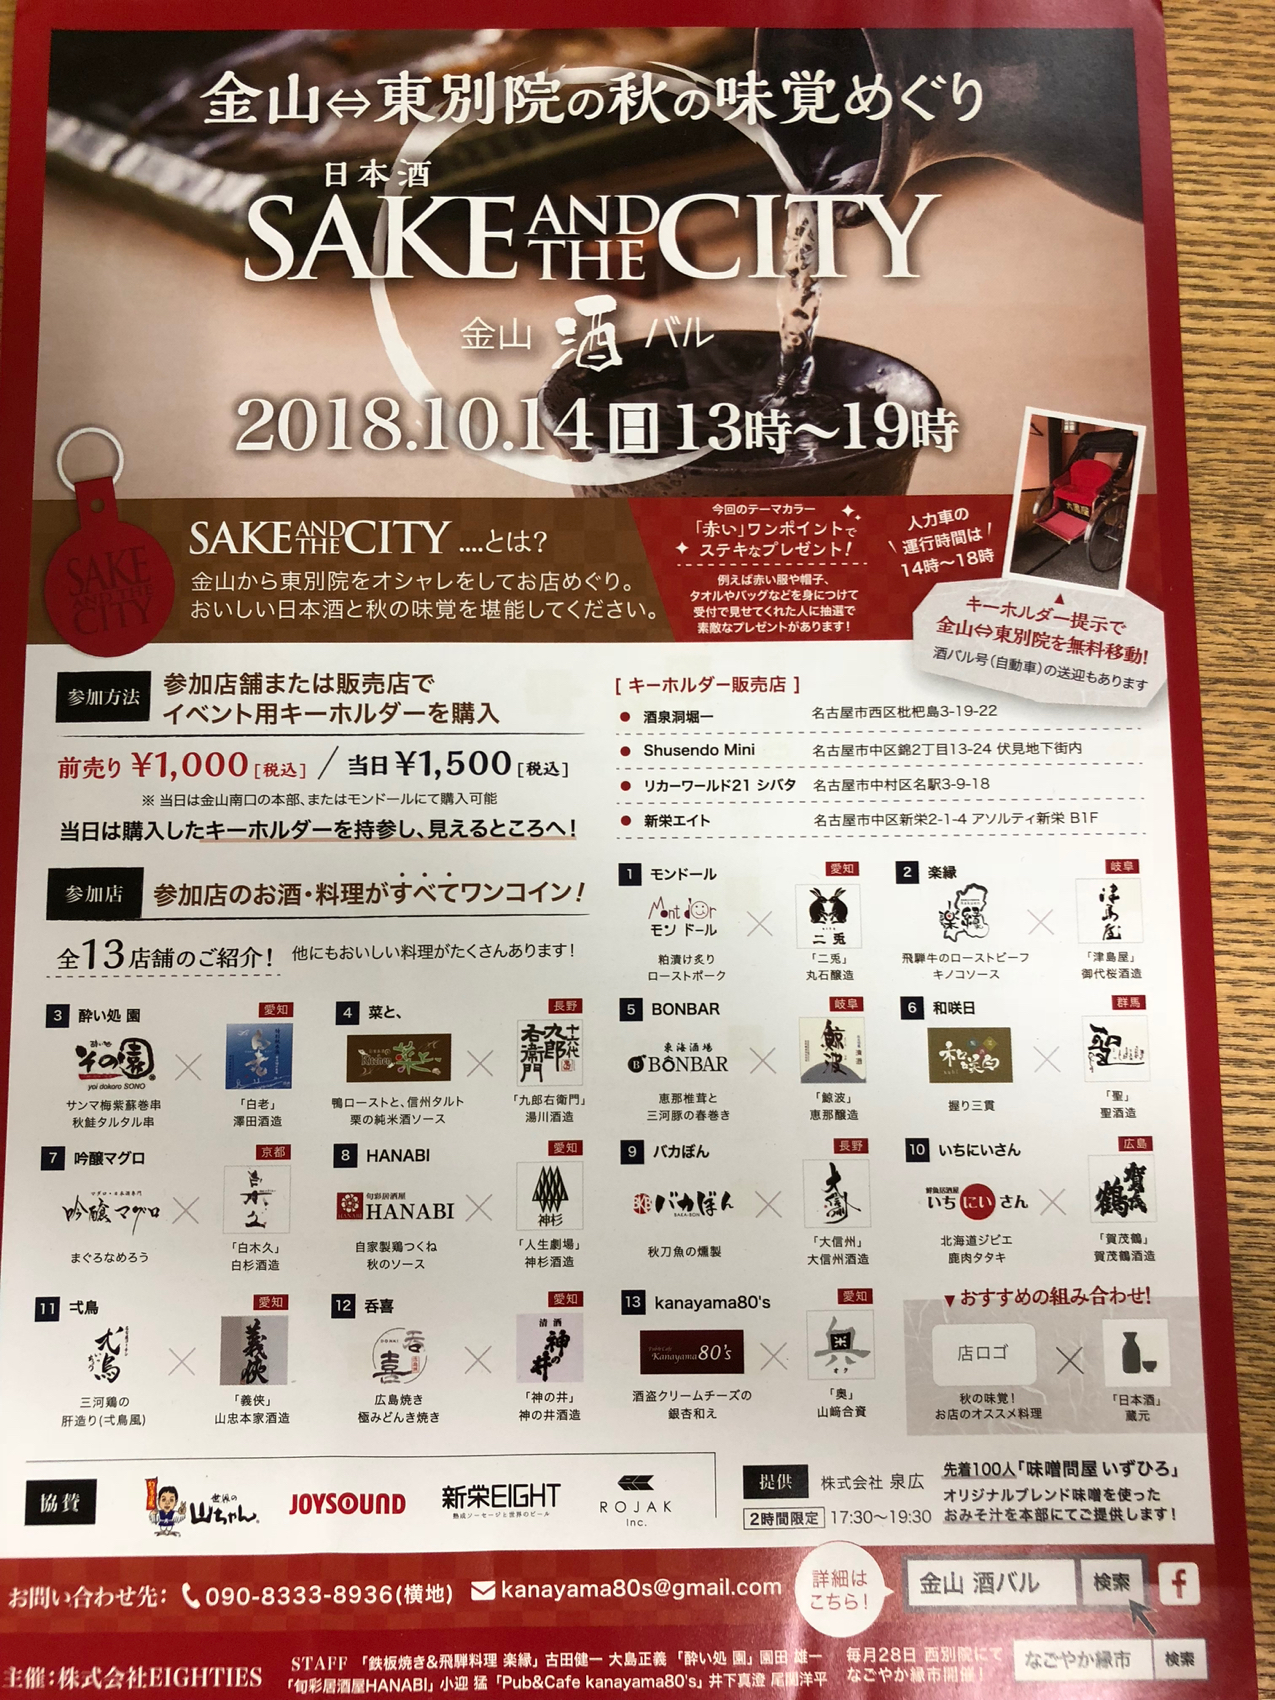 SAKE AND THE CITY 金山